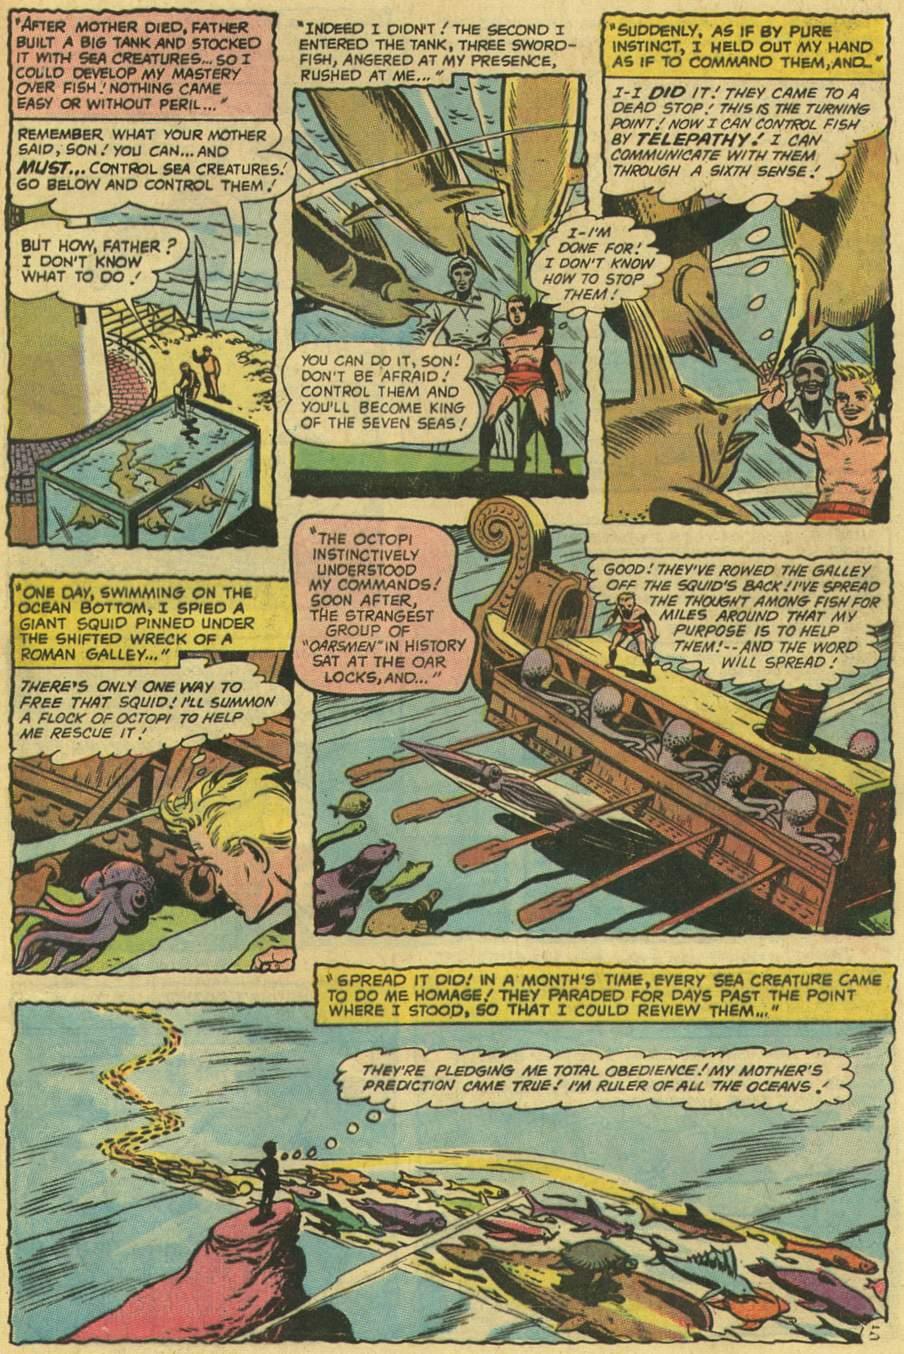 Read online Aquaman (1962) comic -  Issue #48 - 29